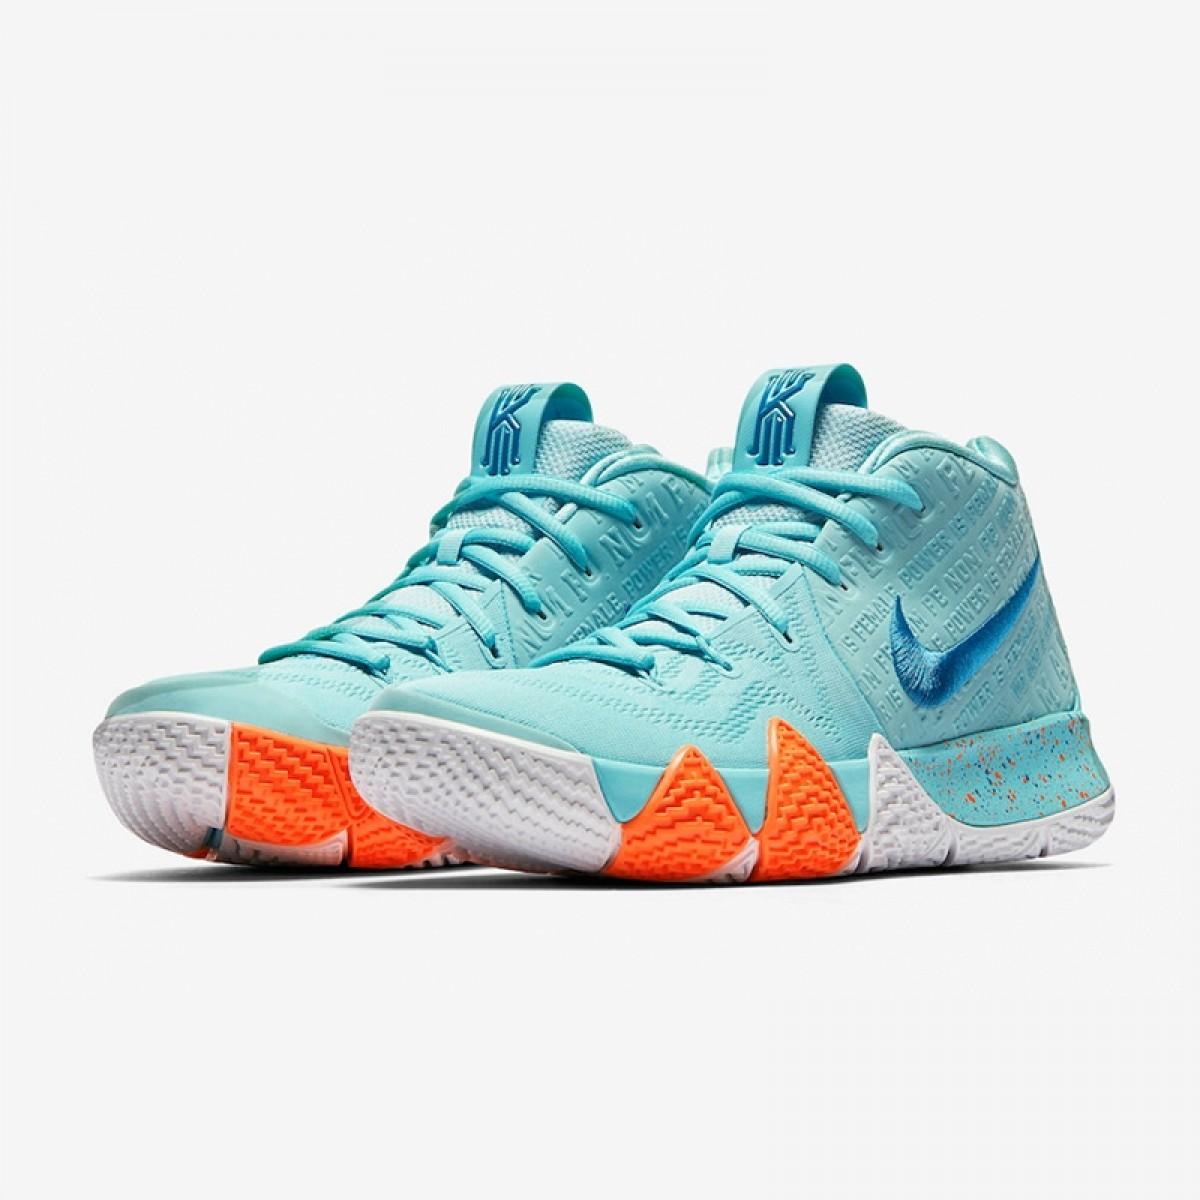 Nike Kyrie 4 'Power is Female'  943806-402